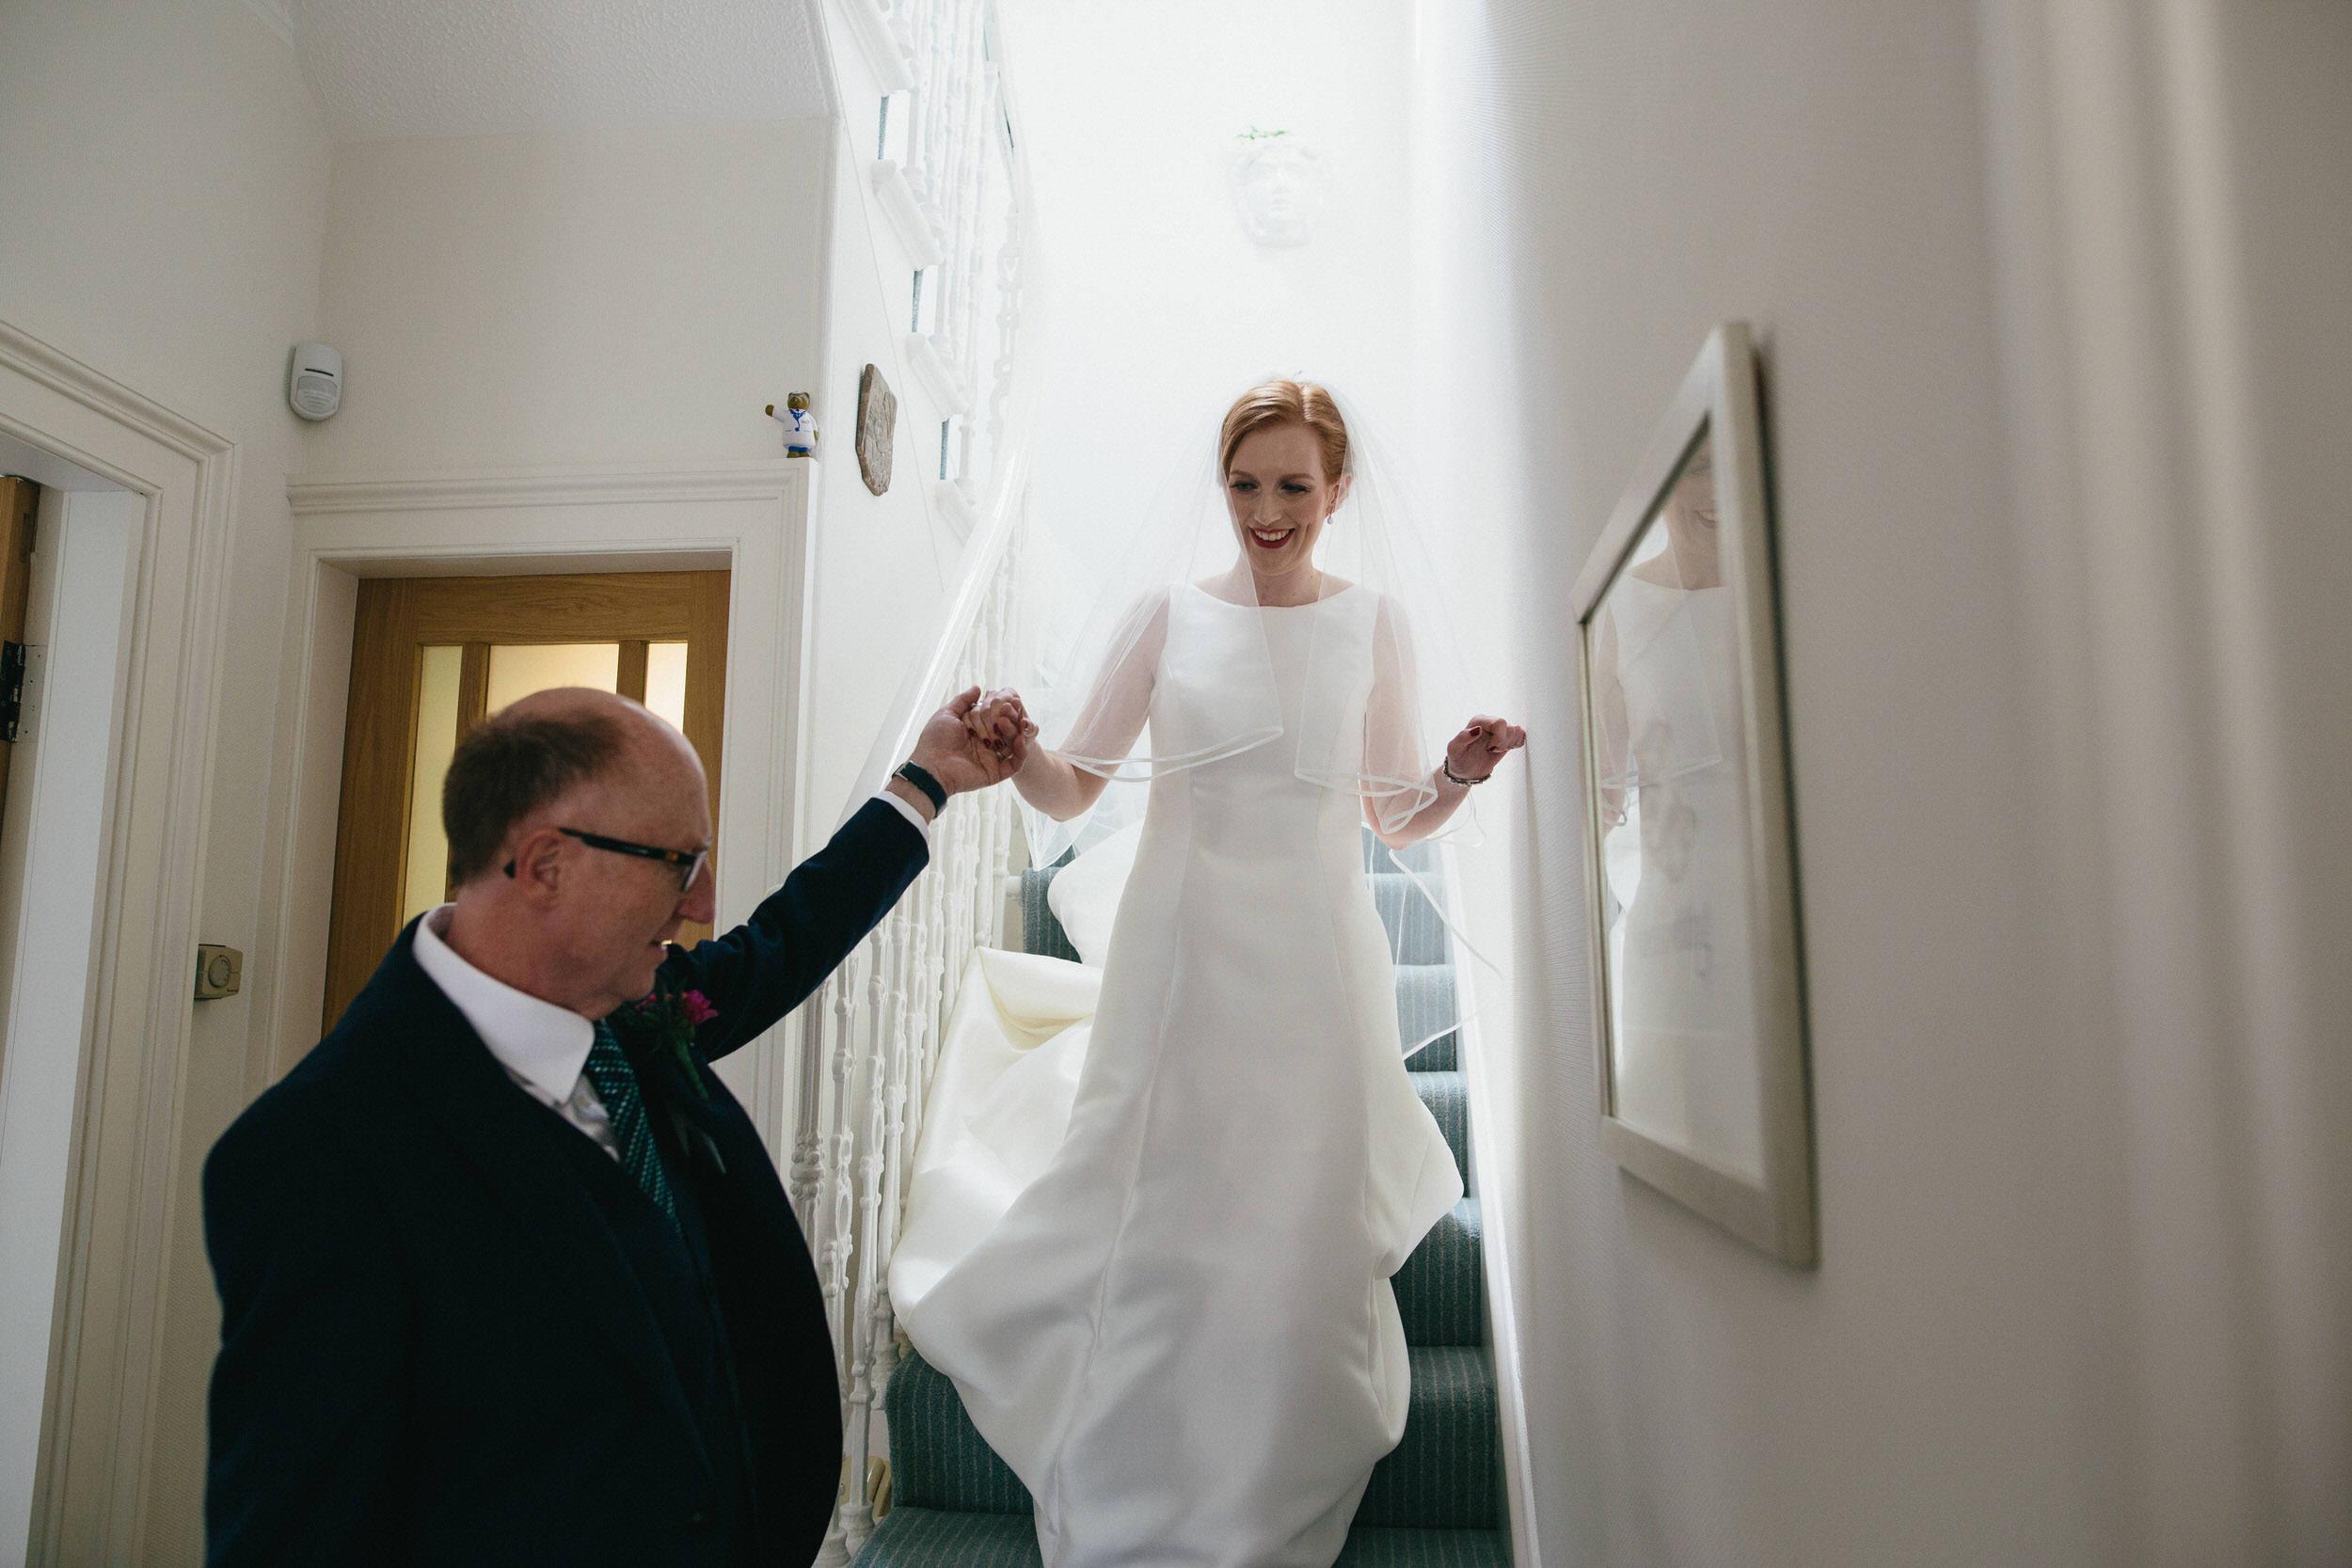 Quirky Wedding Photographer Scotland Glasgow Edinburgh Mirrorbox 052.jpg